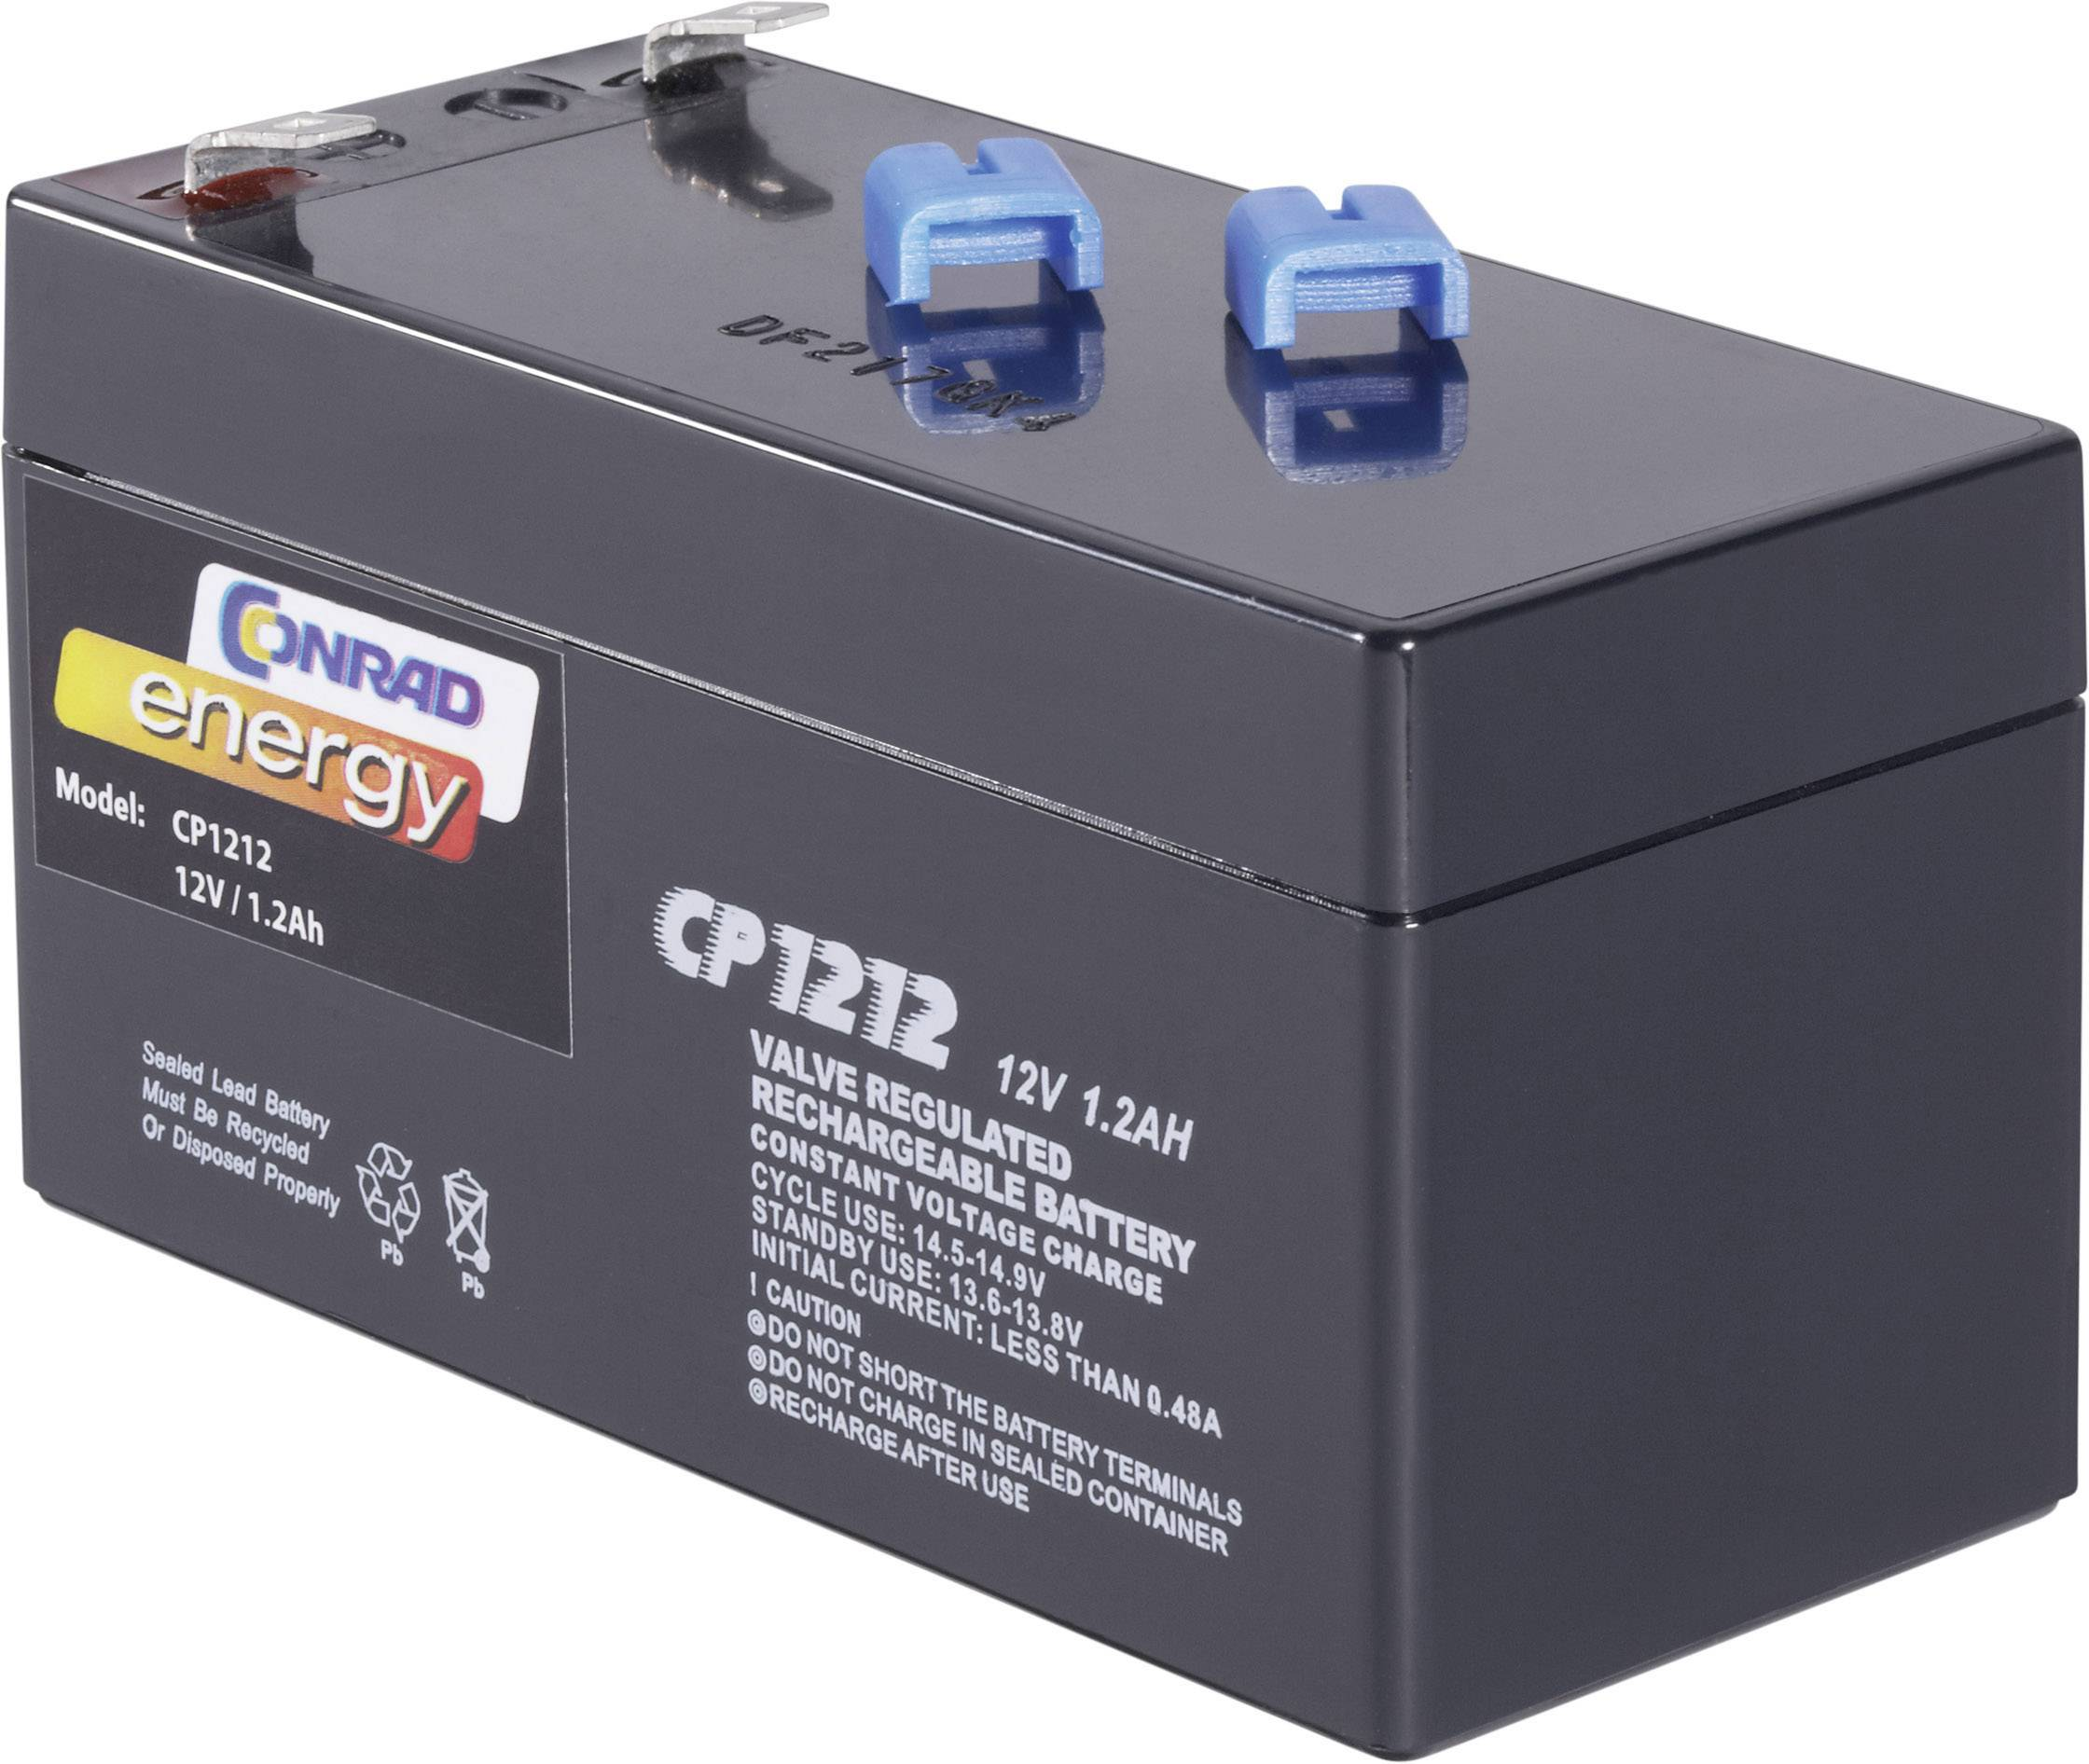 Olověný akumulátor, 12 V/1,2 Ah, Conrad energy